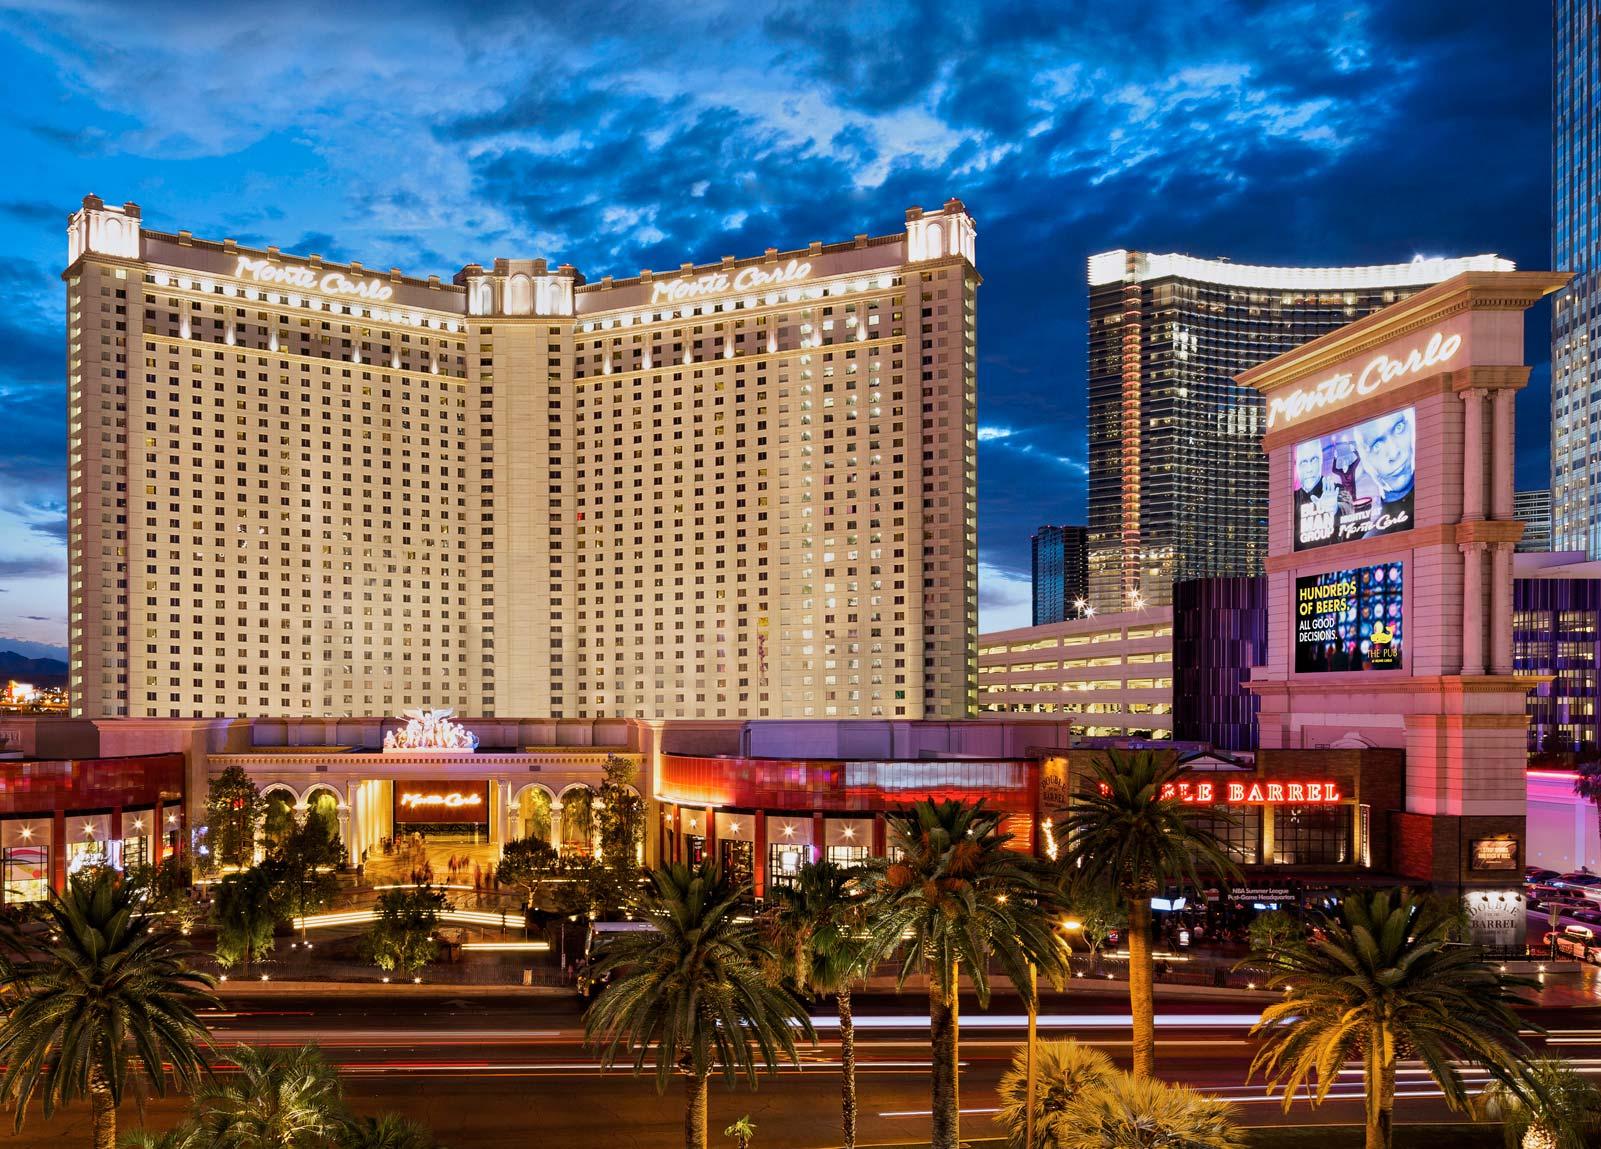 monte carlo hotel in las vegas - monte carlo resort las vegas